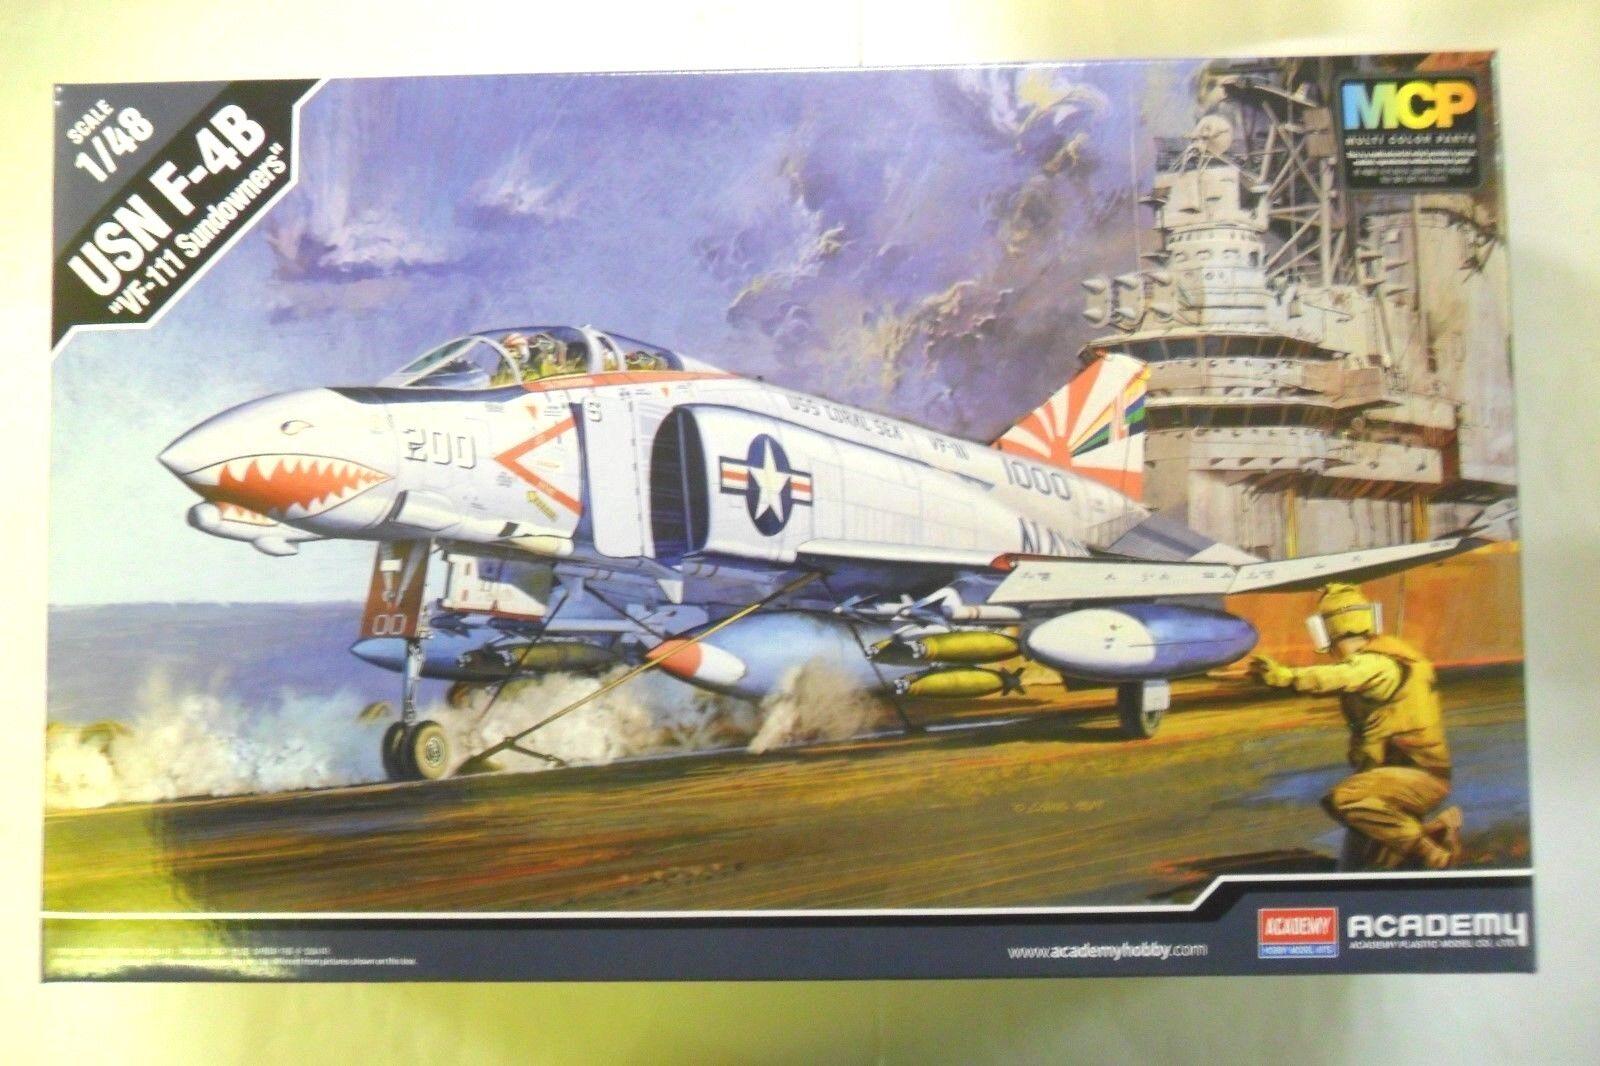 ACADEMY 1 48 KIT AEREO PLANE DA MONTARE MONTARE MONTARE USN F-4B VF-111 SUNDOWNERS  ART 12232 f06f19